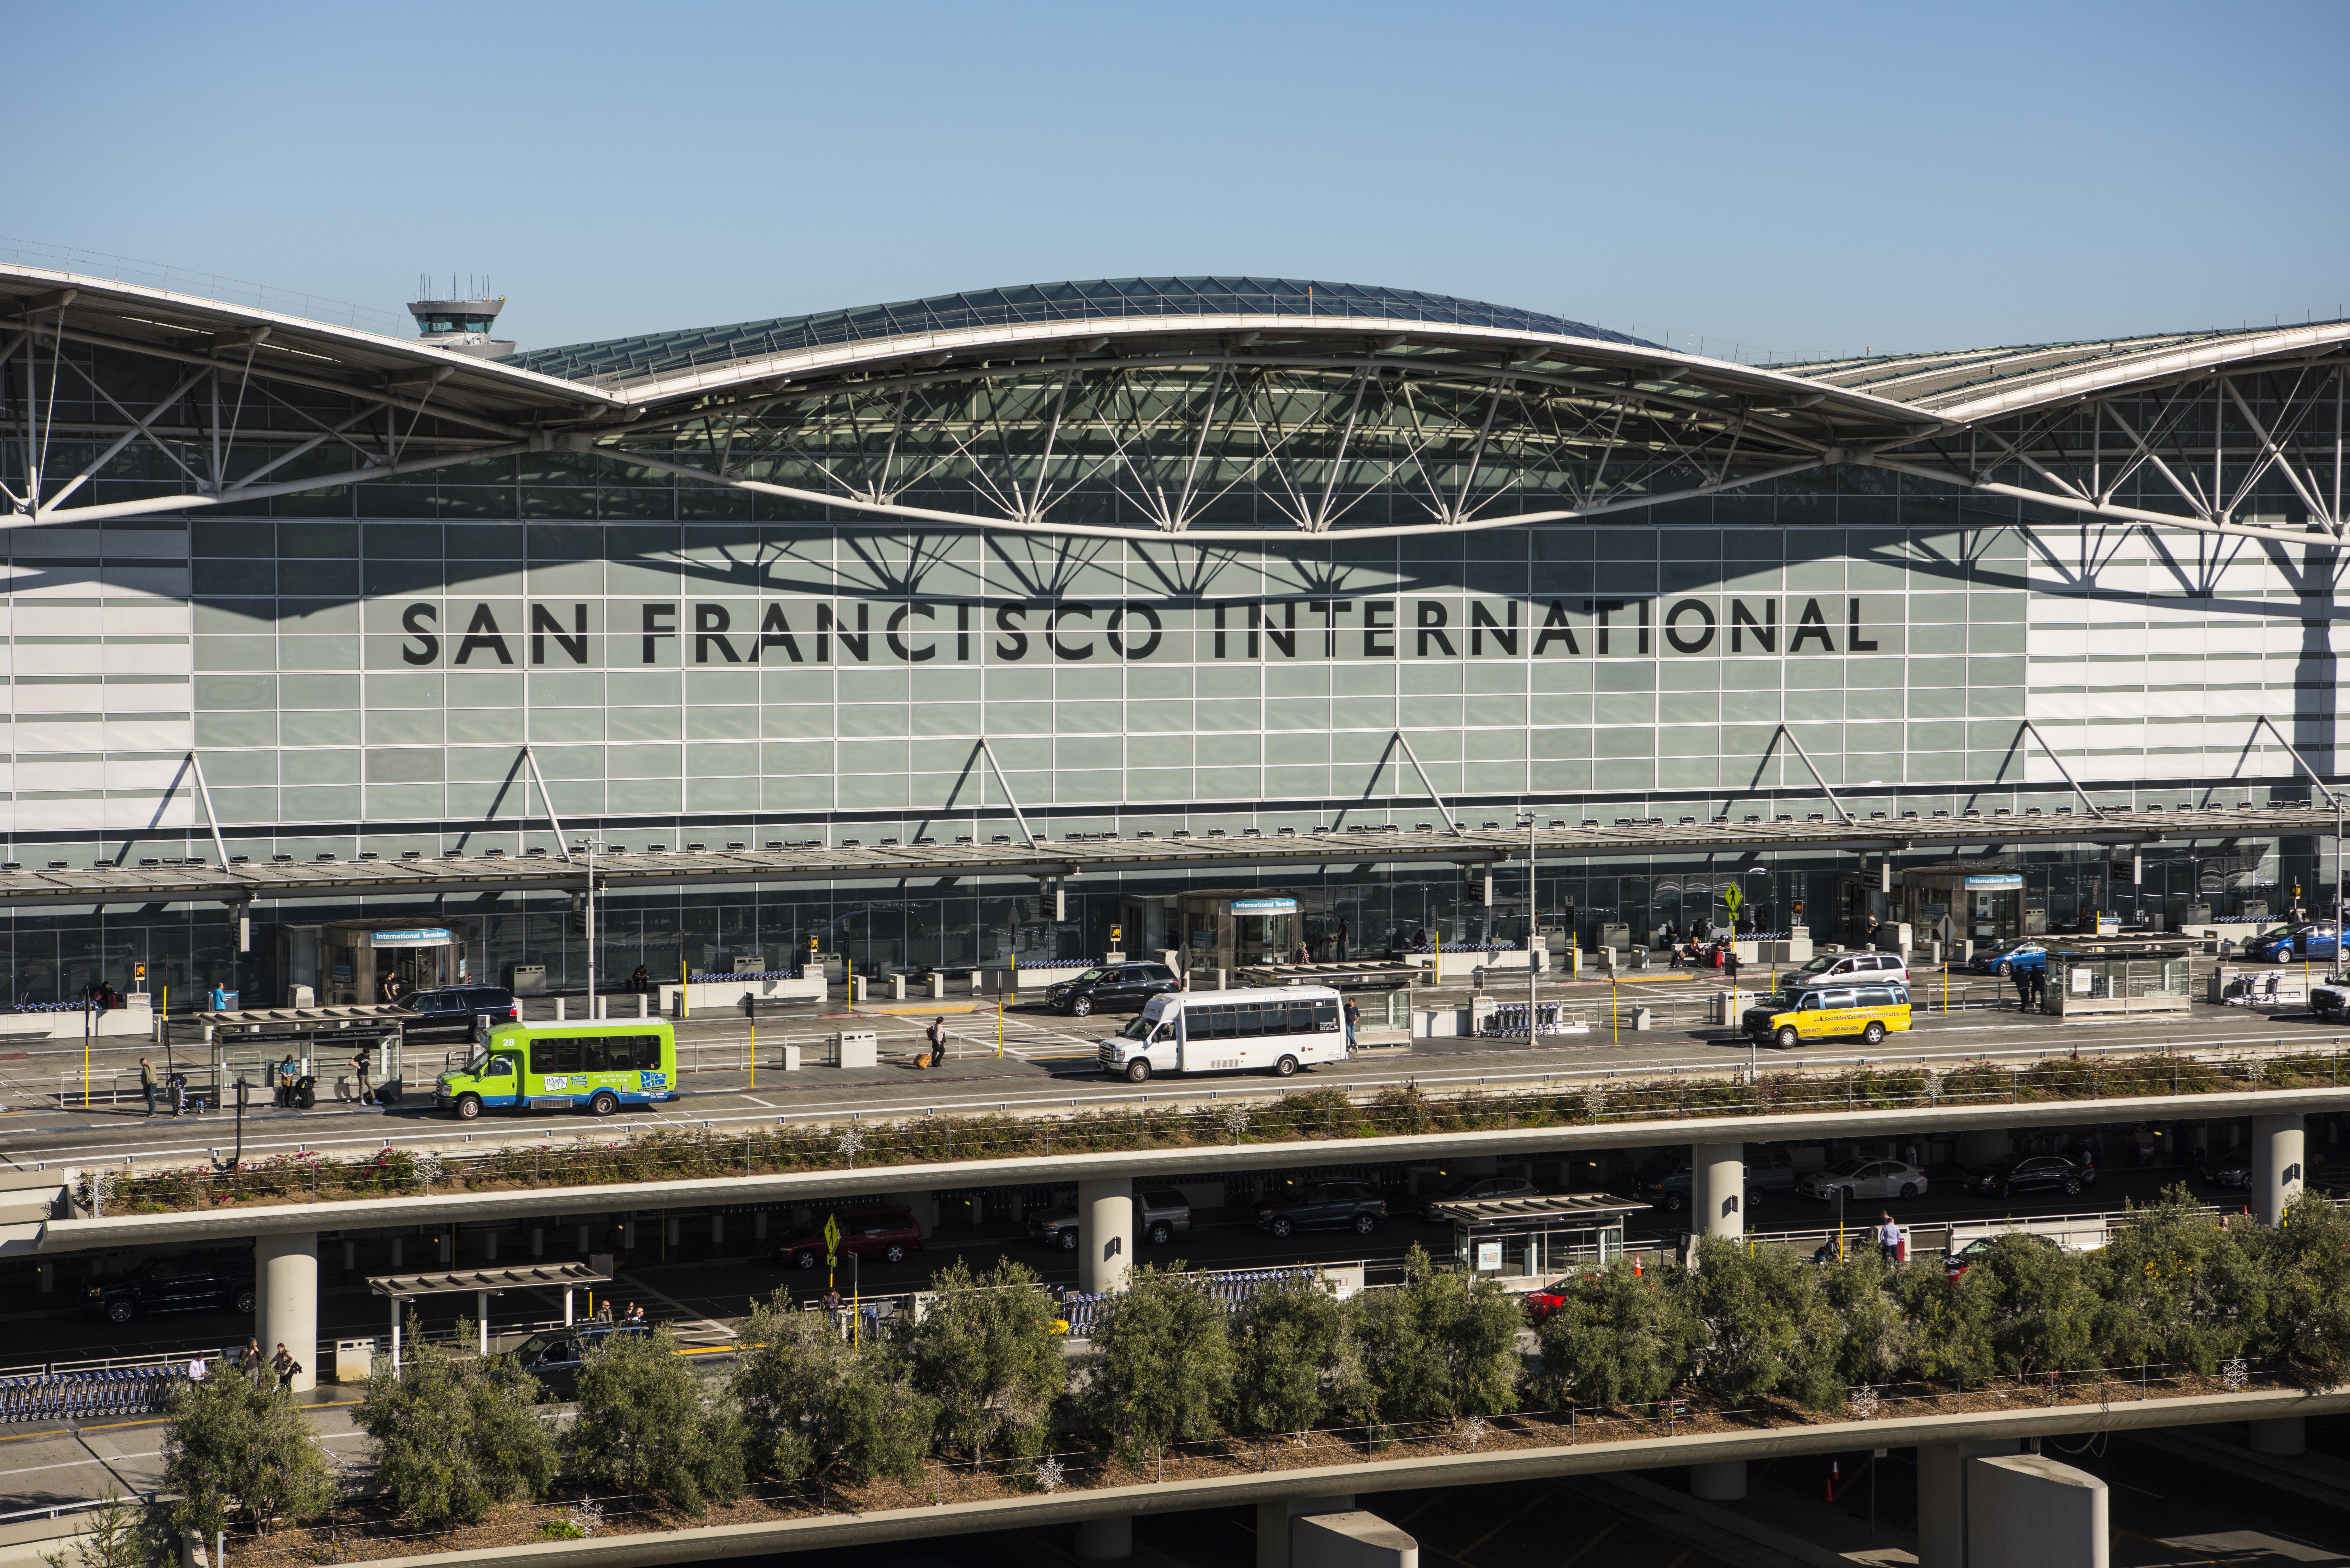 San Francisco International Airport exterior.